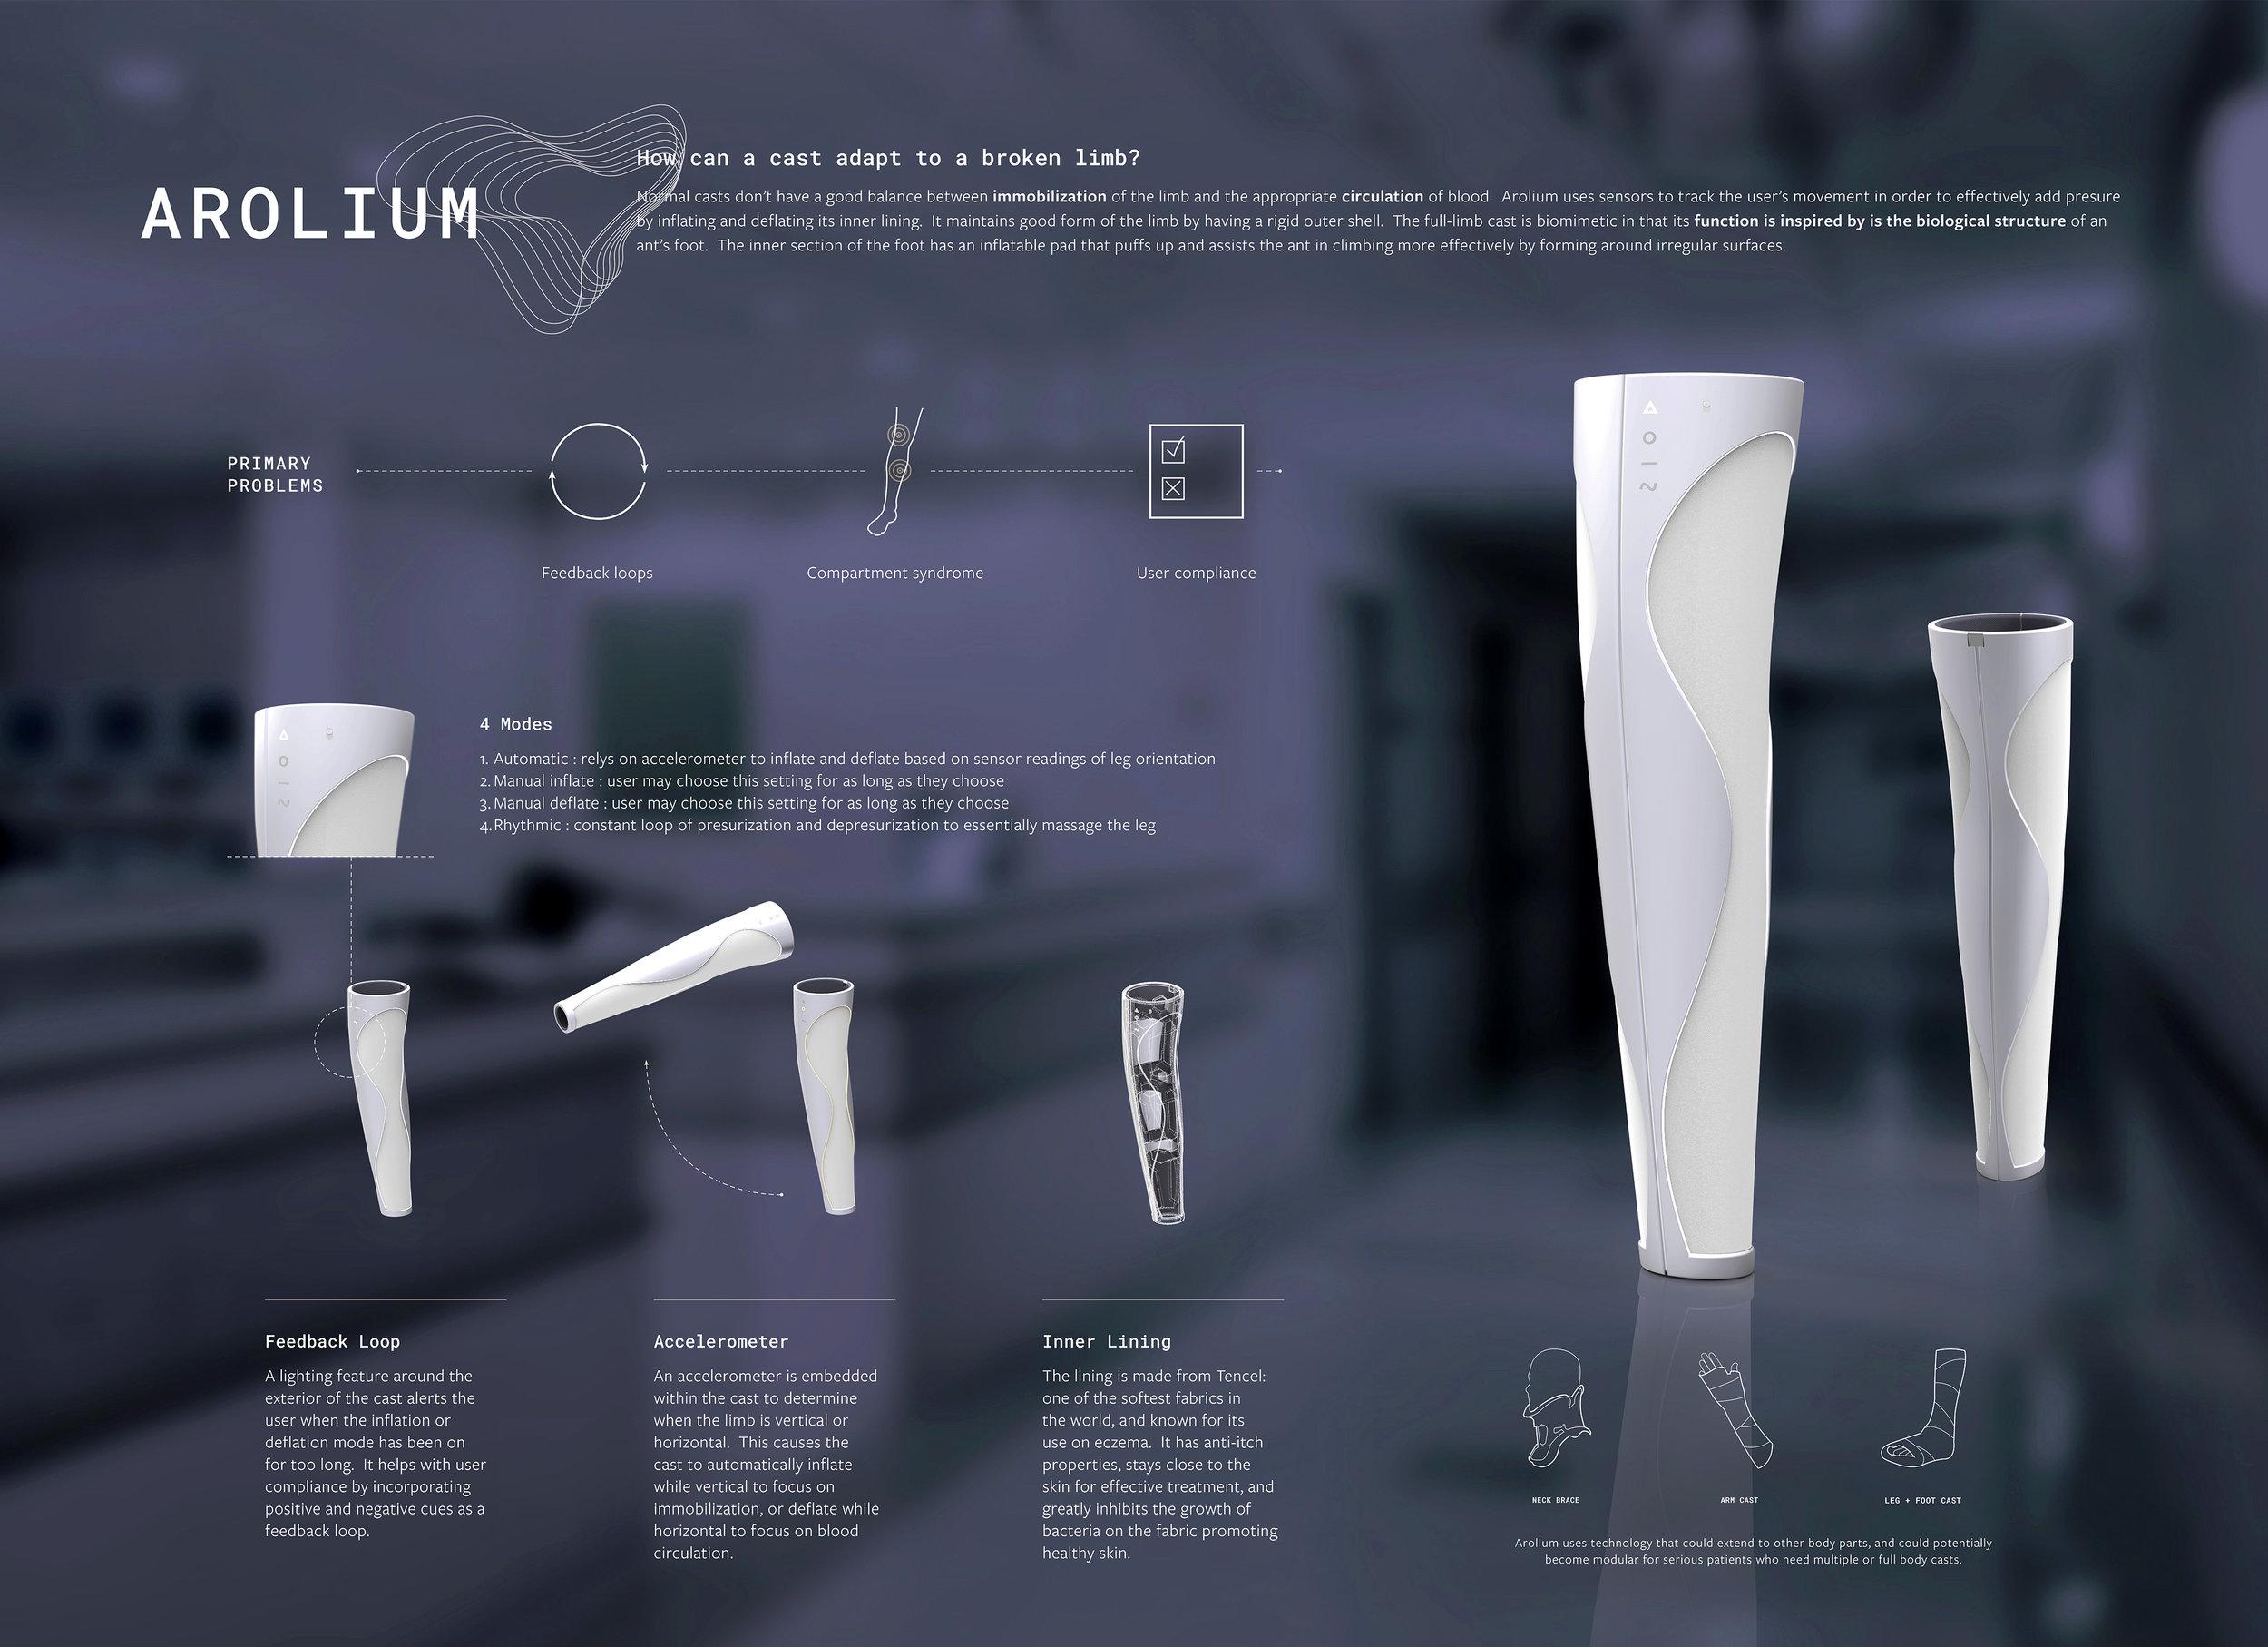 Arolium poster.jpg